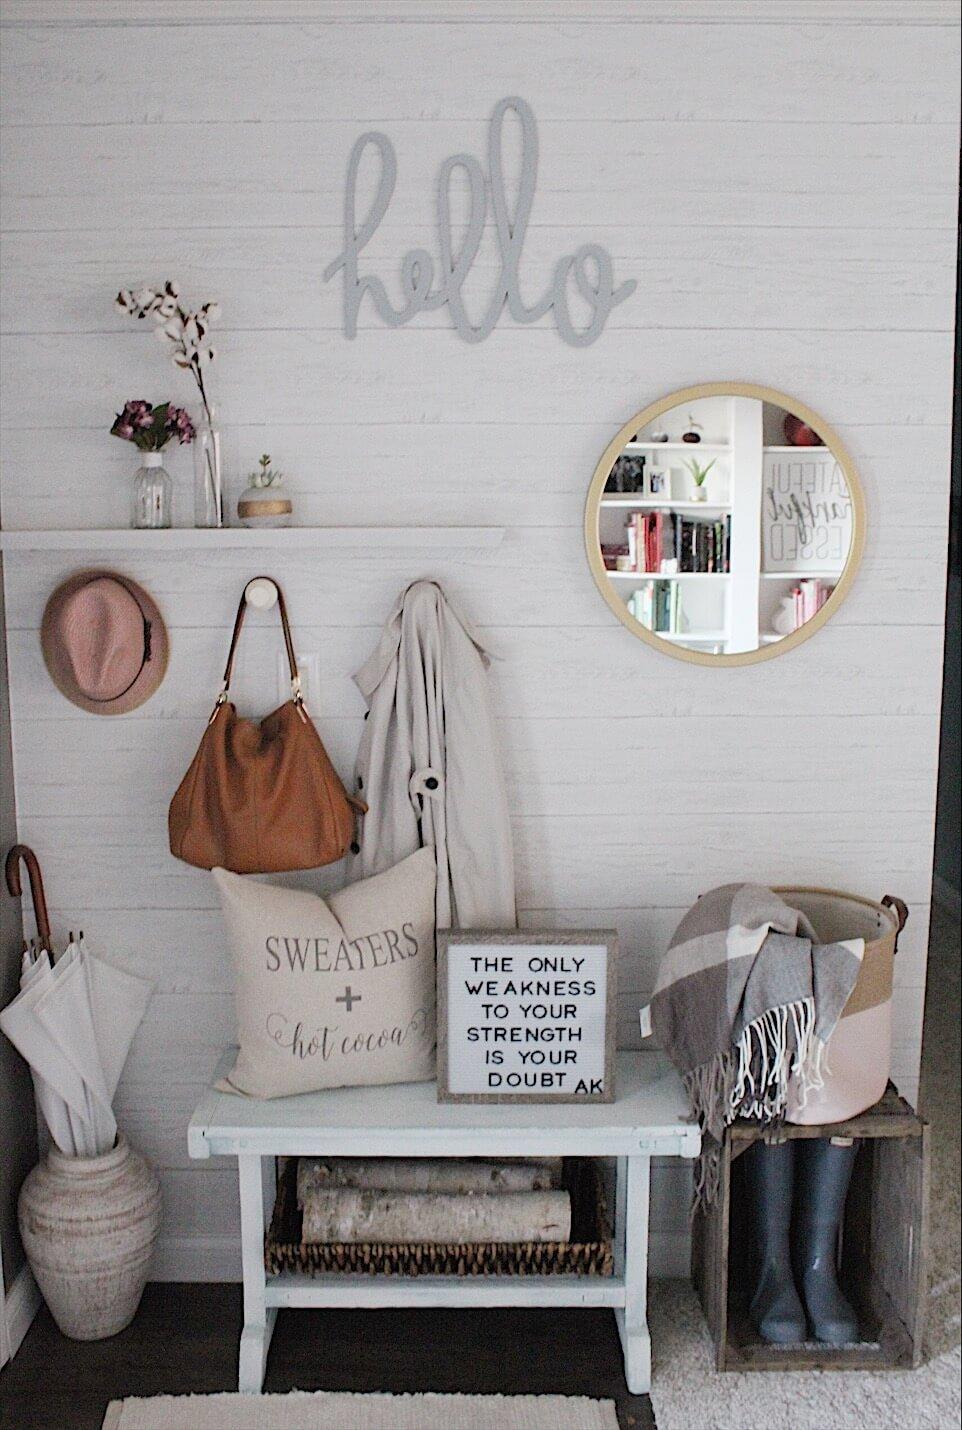 08g-best-rustic-entryway-decorating-ideas-homebnc-v6